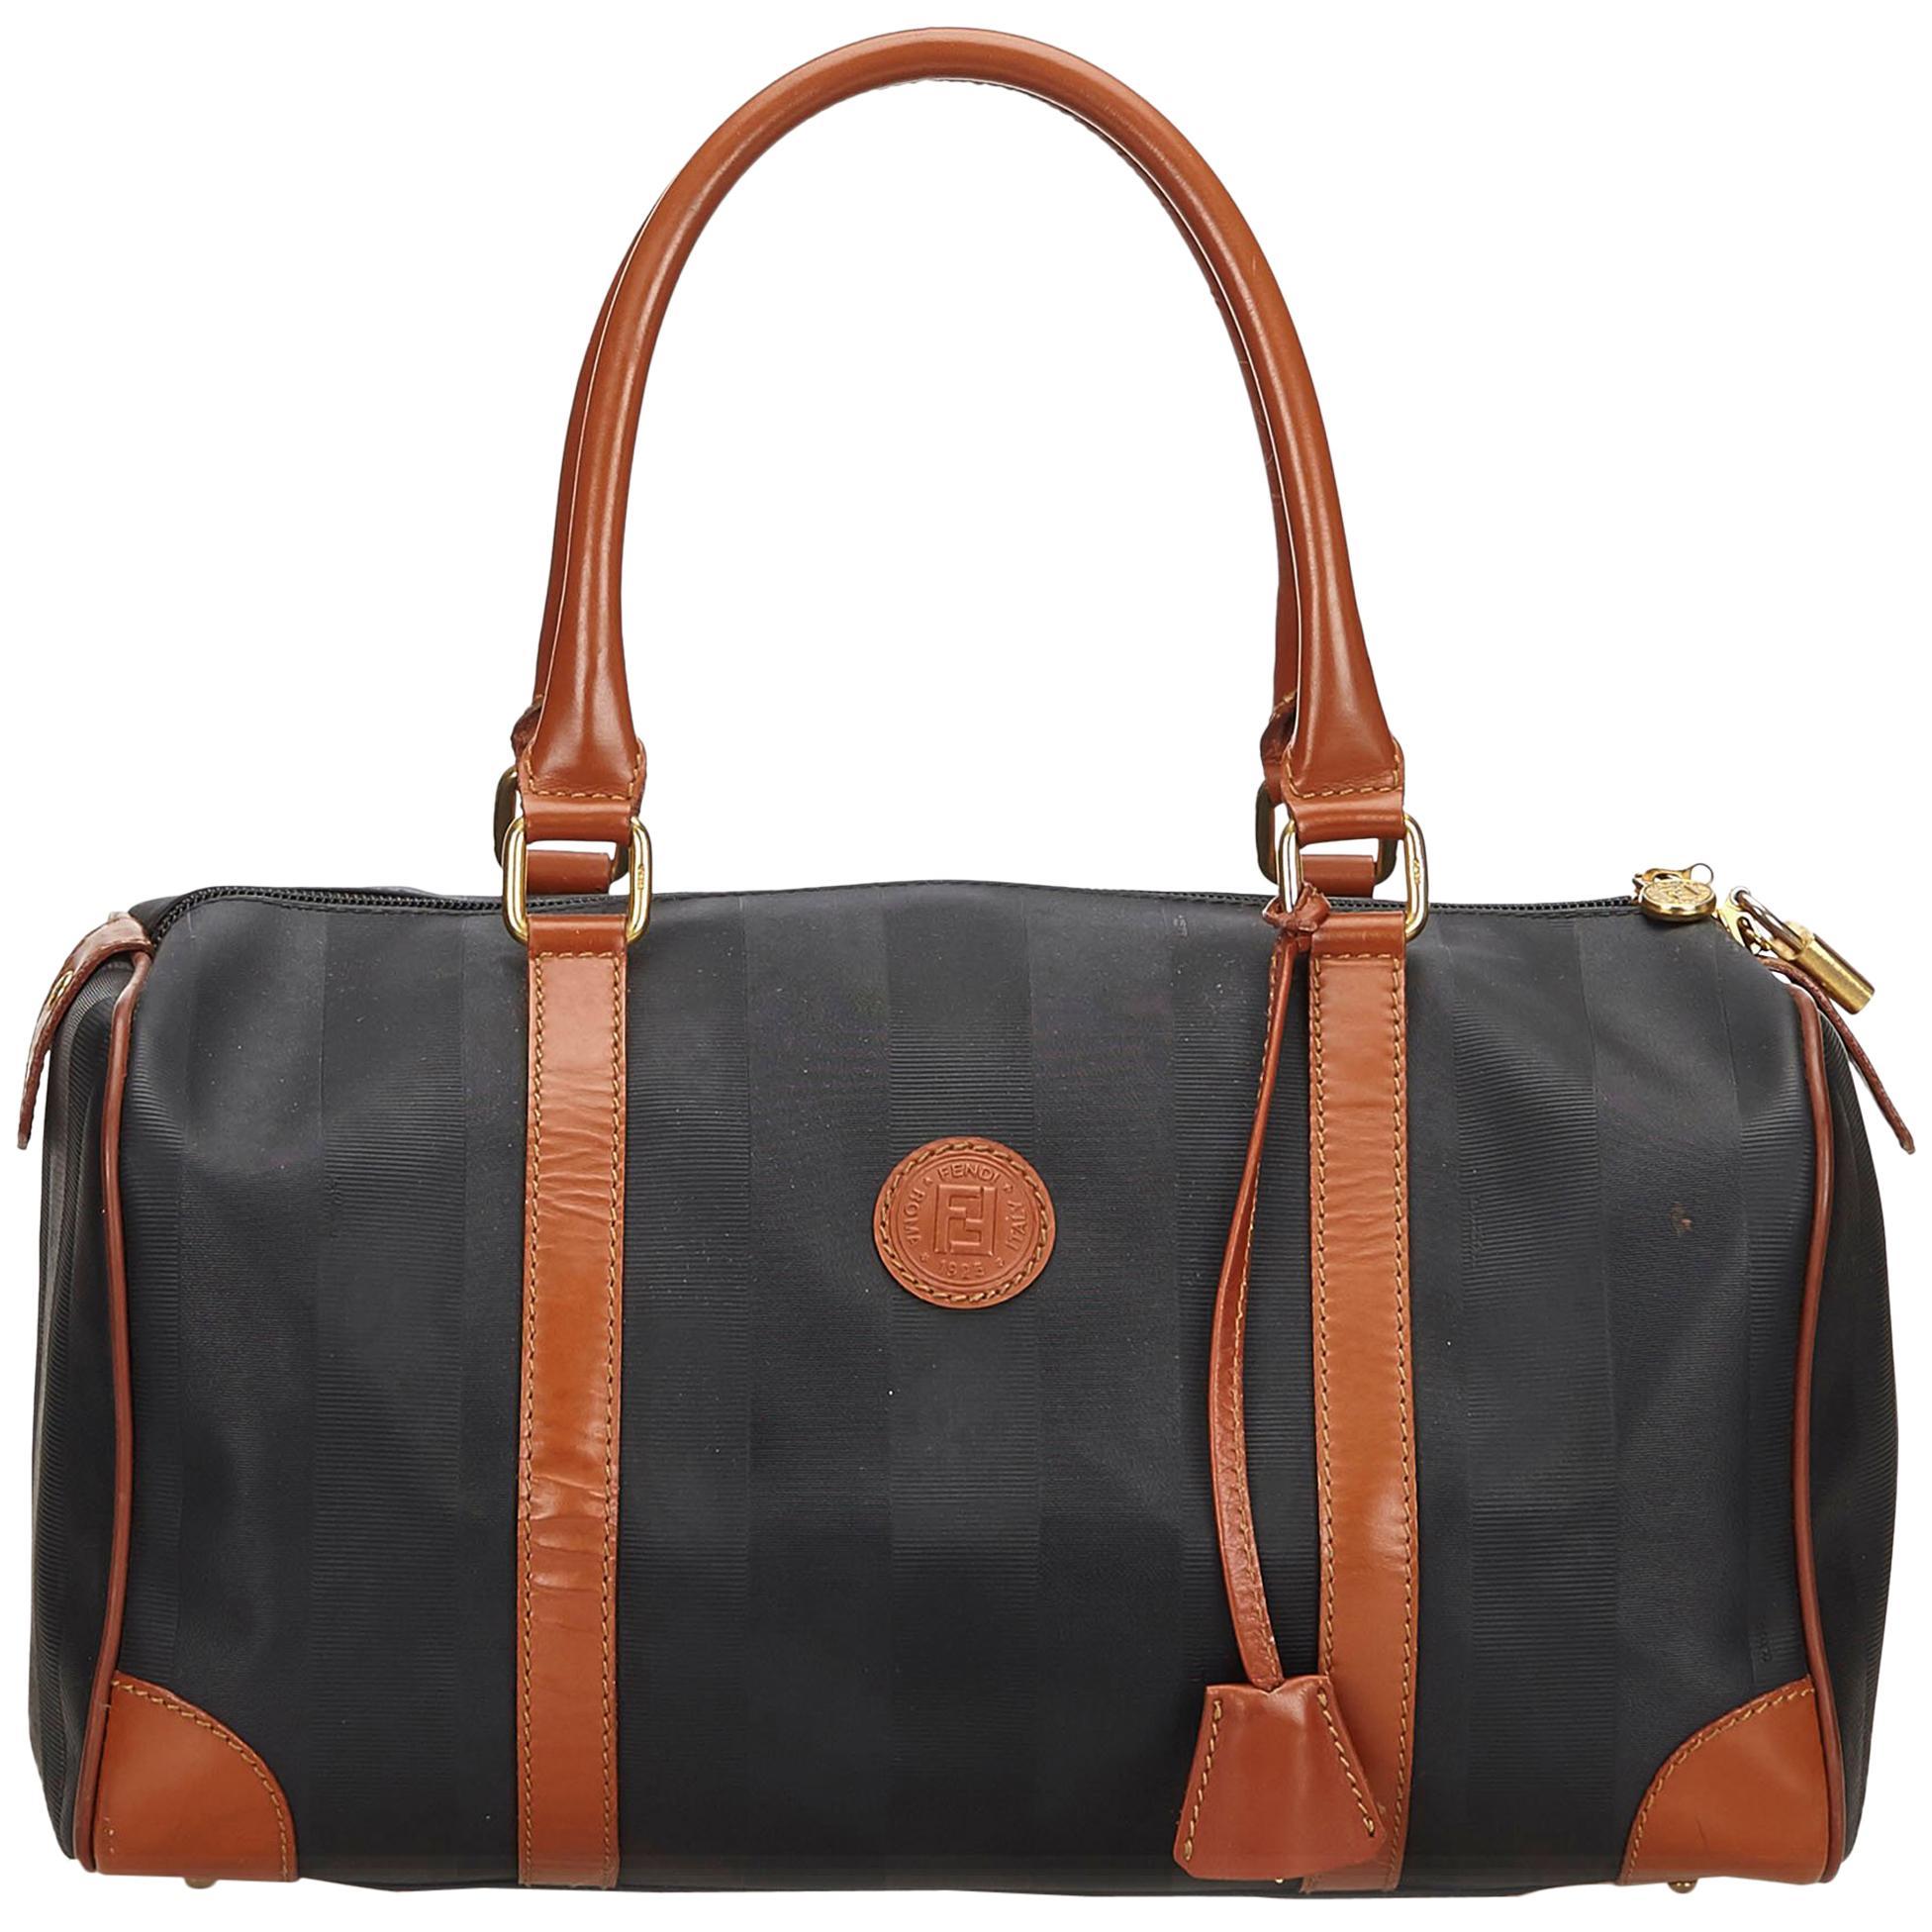 579d0b8881 ... discount code for fendi brown x black pvc pequin boston bag for sale  34b82 68e07